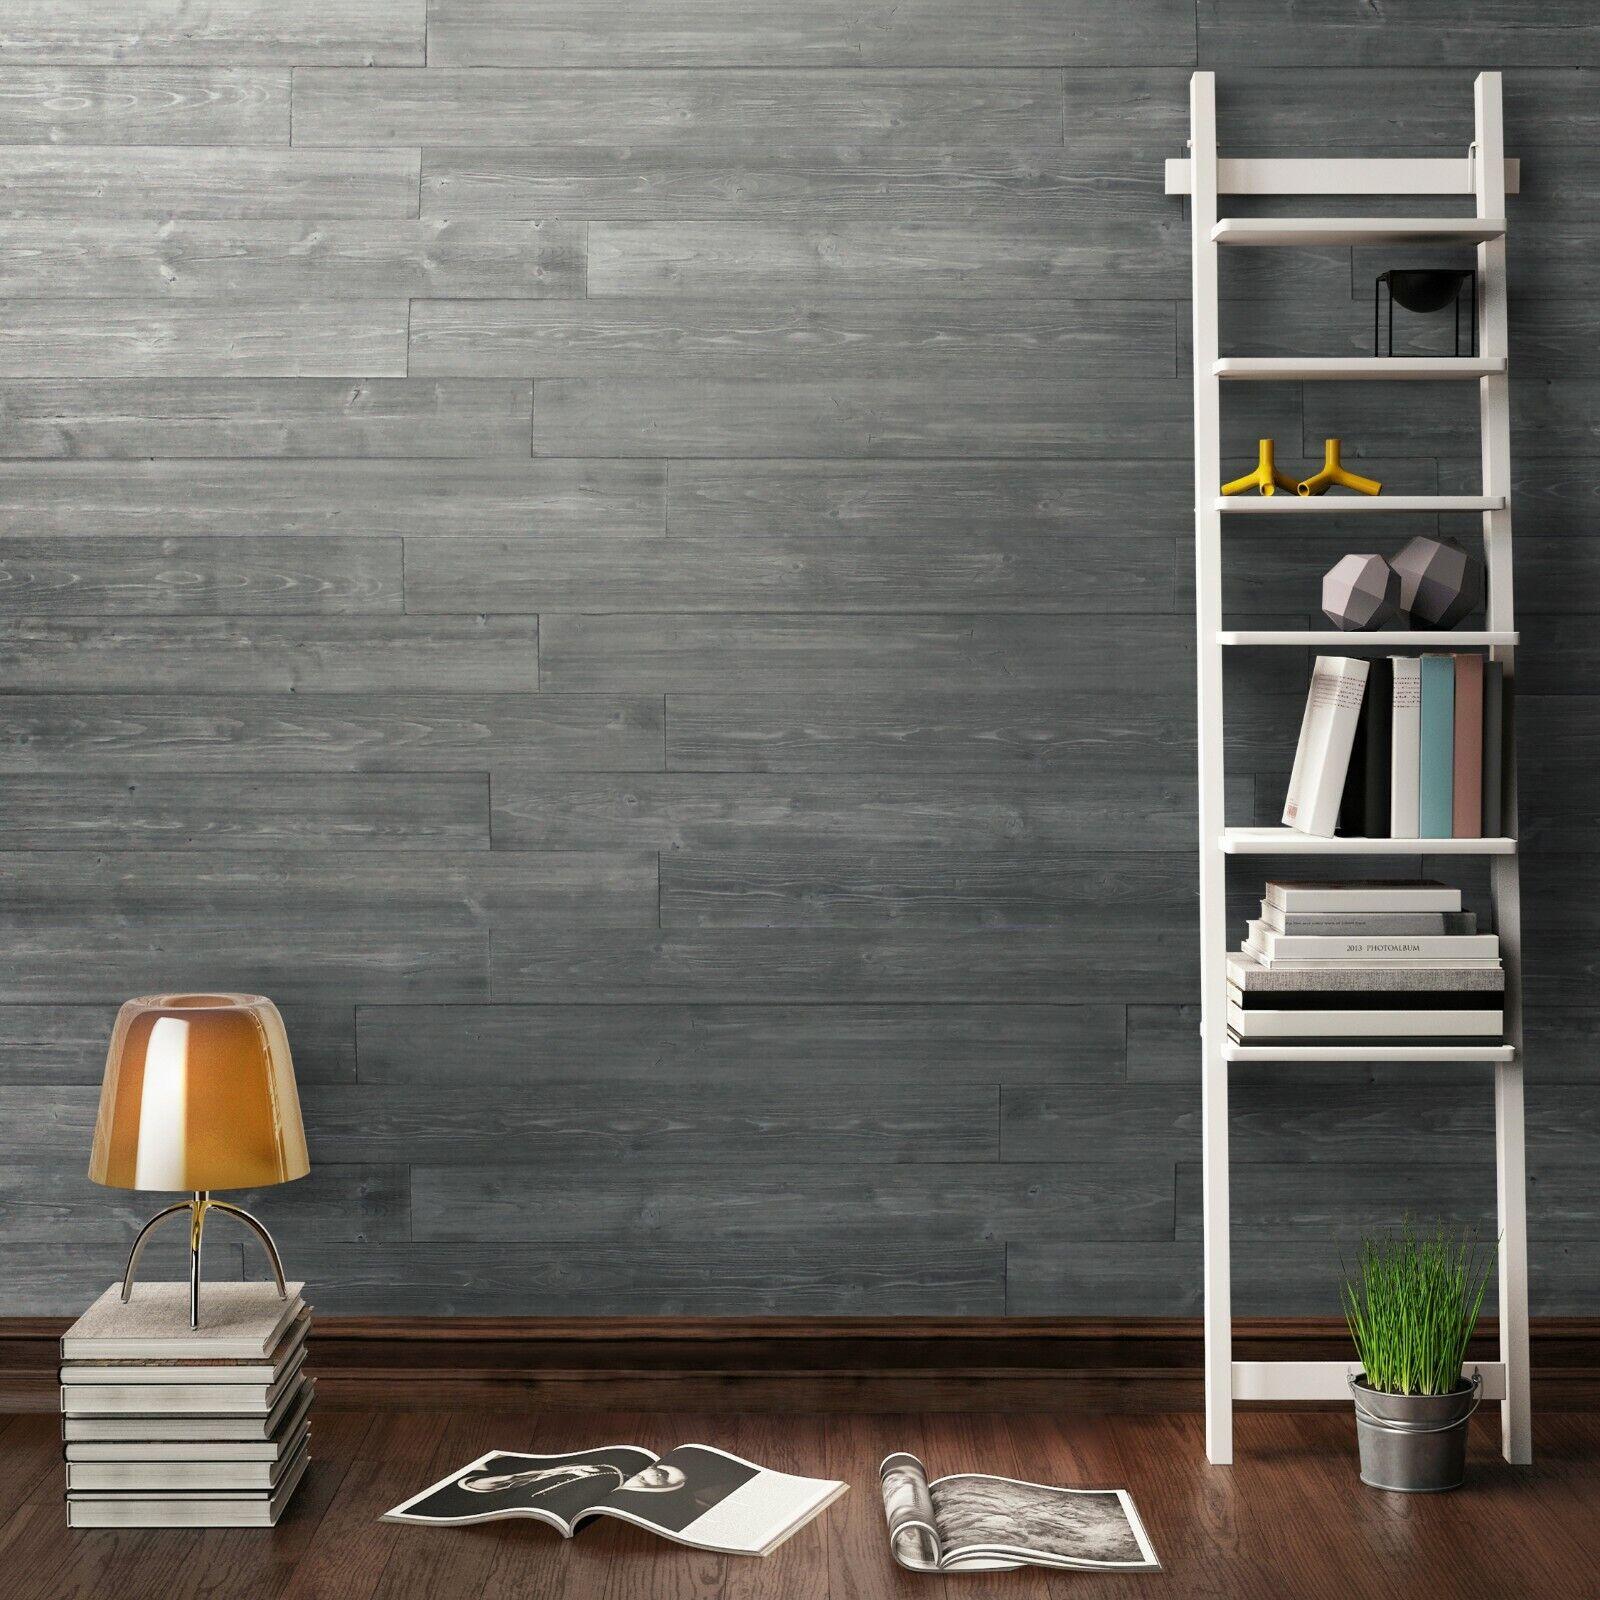 10pcs Natural Wood Wall Panel Reclaimed